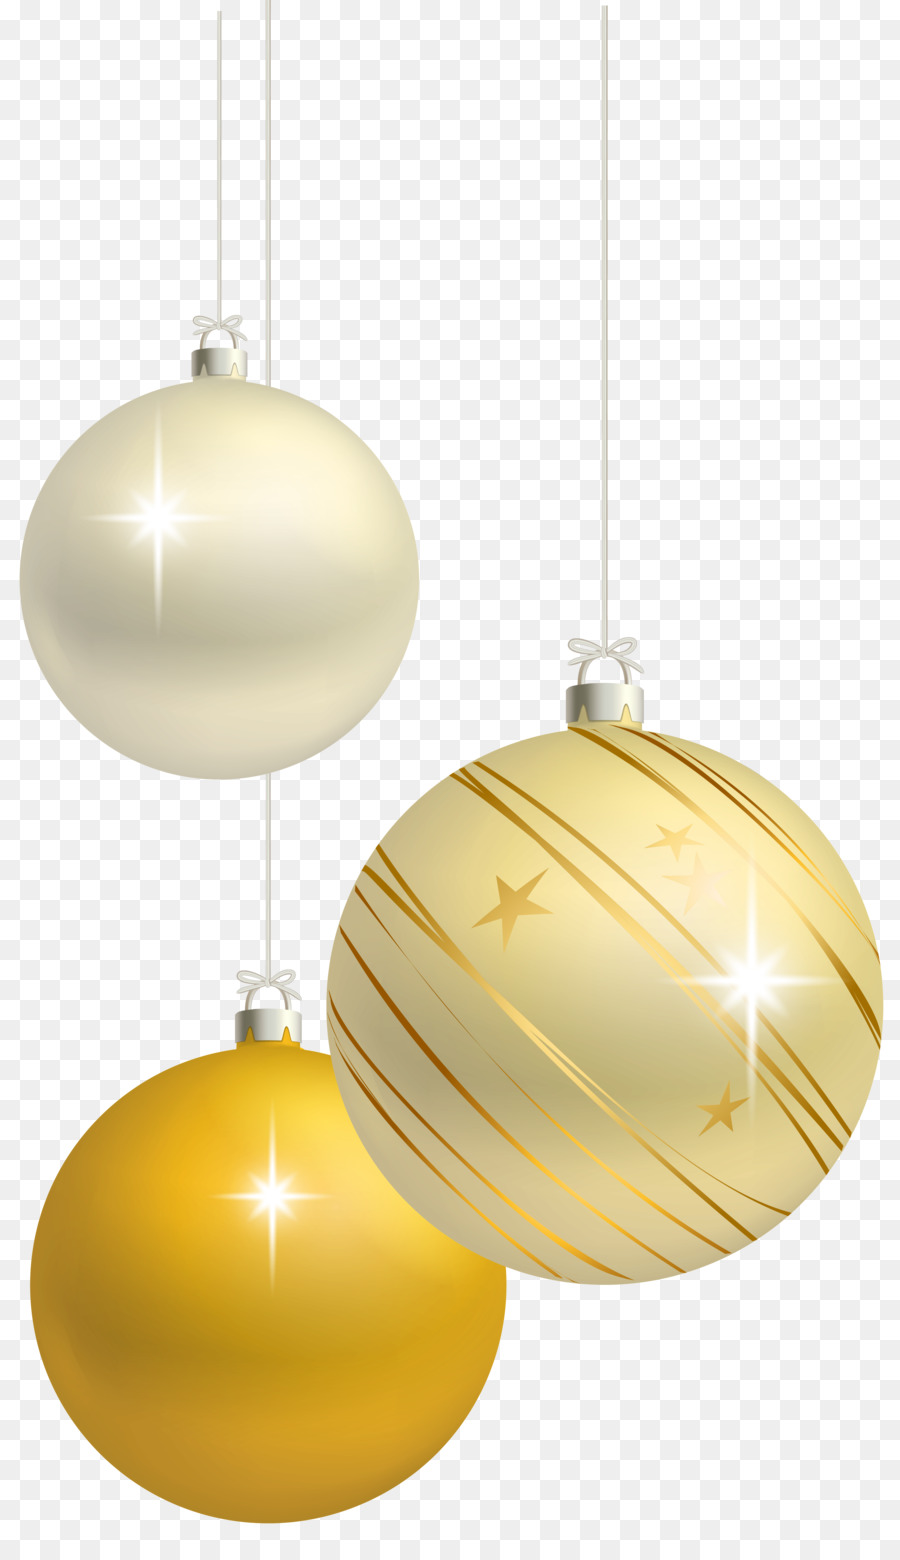 Christmas ornament Christmas tree Clip art - white christmas png ...